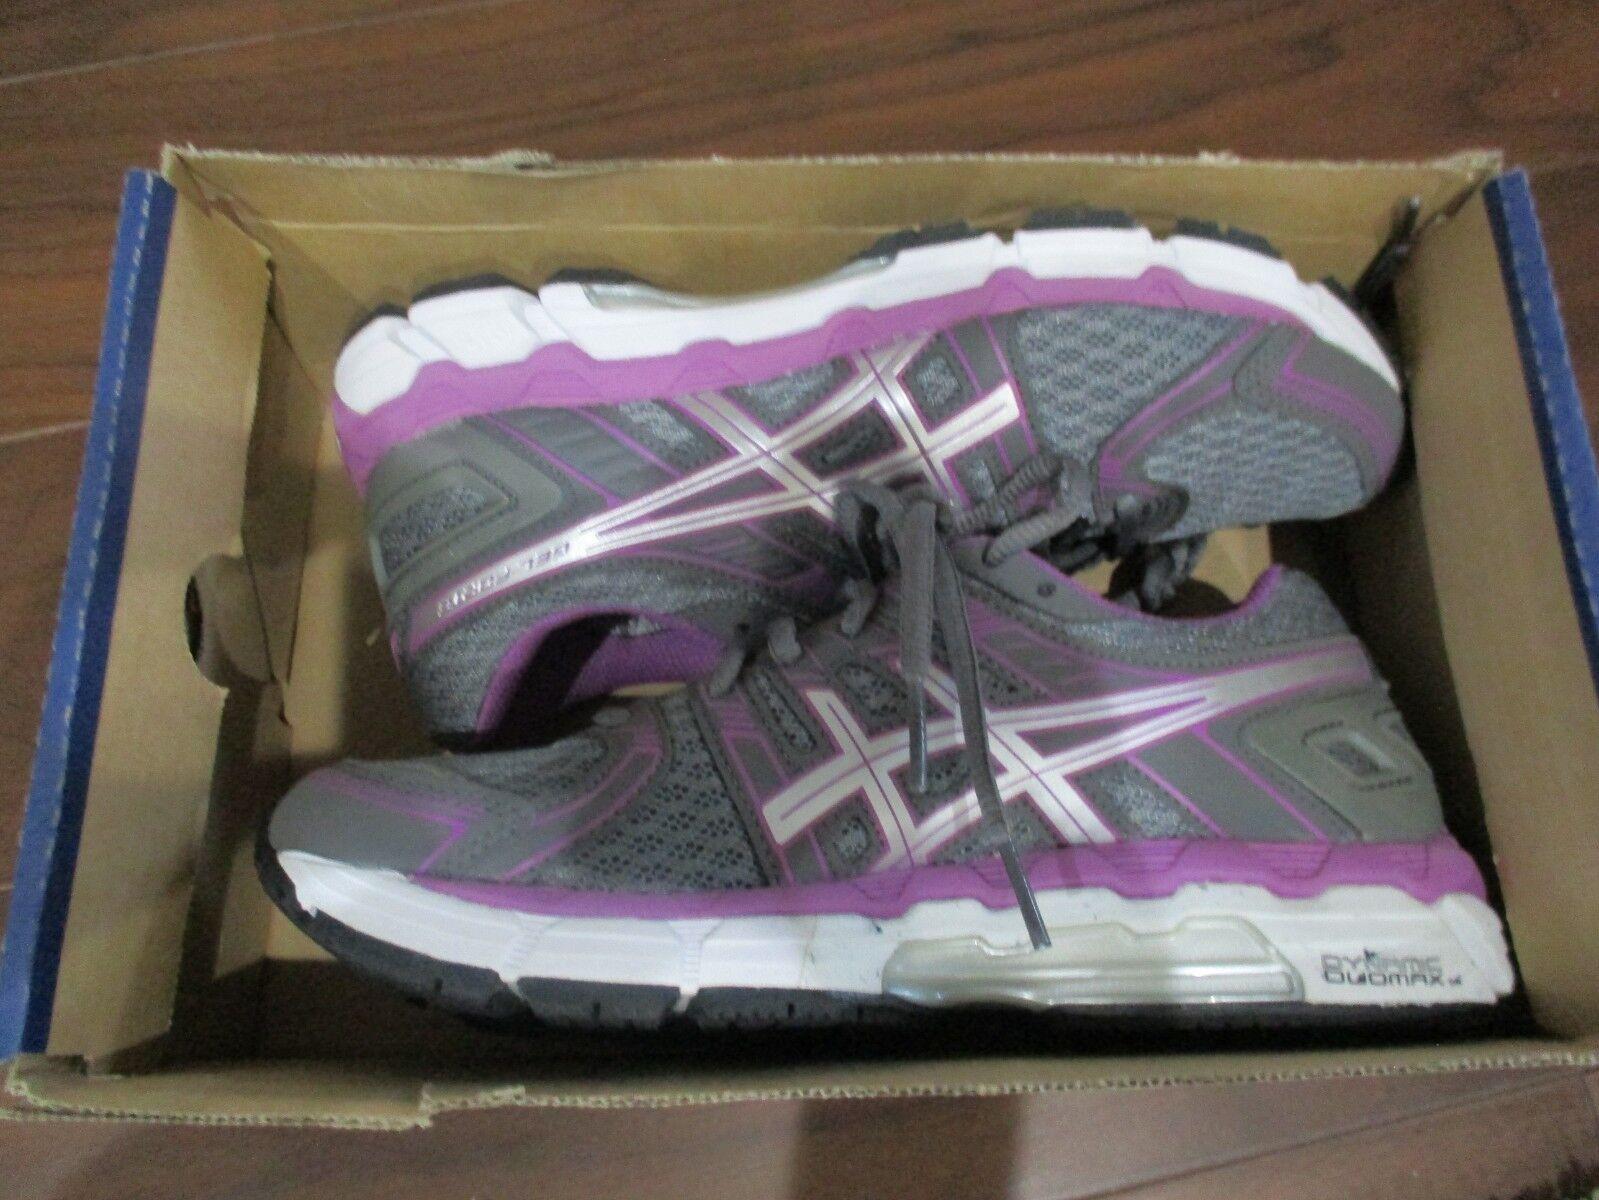 BNIB ASICS GEL Forte Road Running shoes, Women, T359N, Size 6.5, grey purple